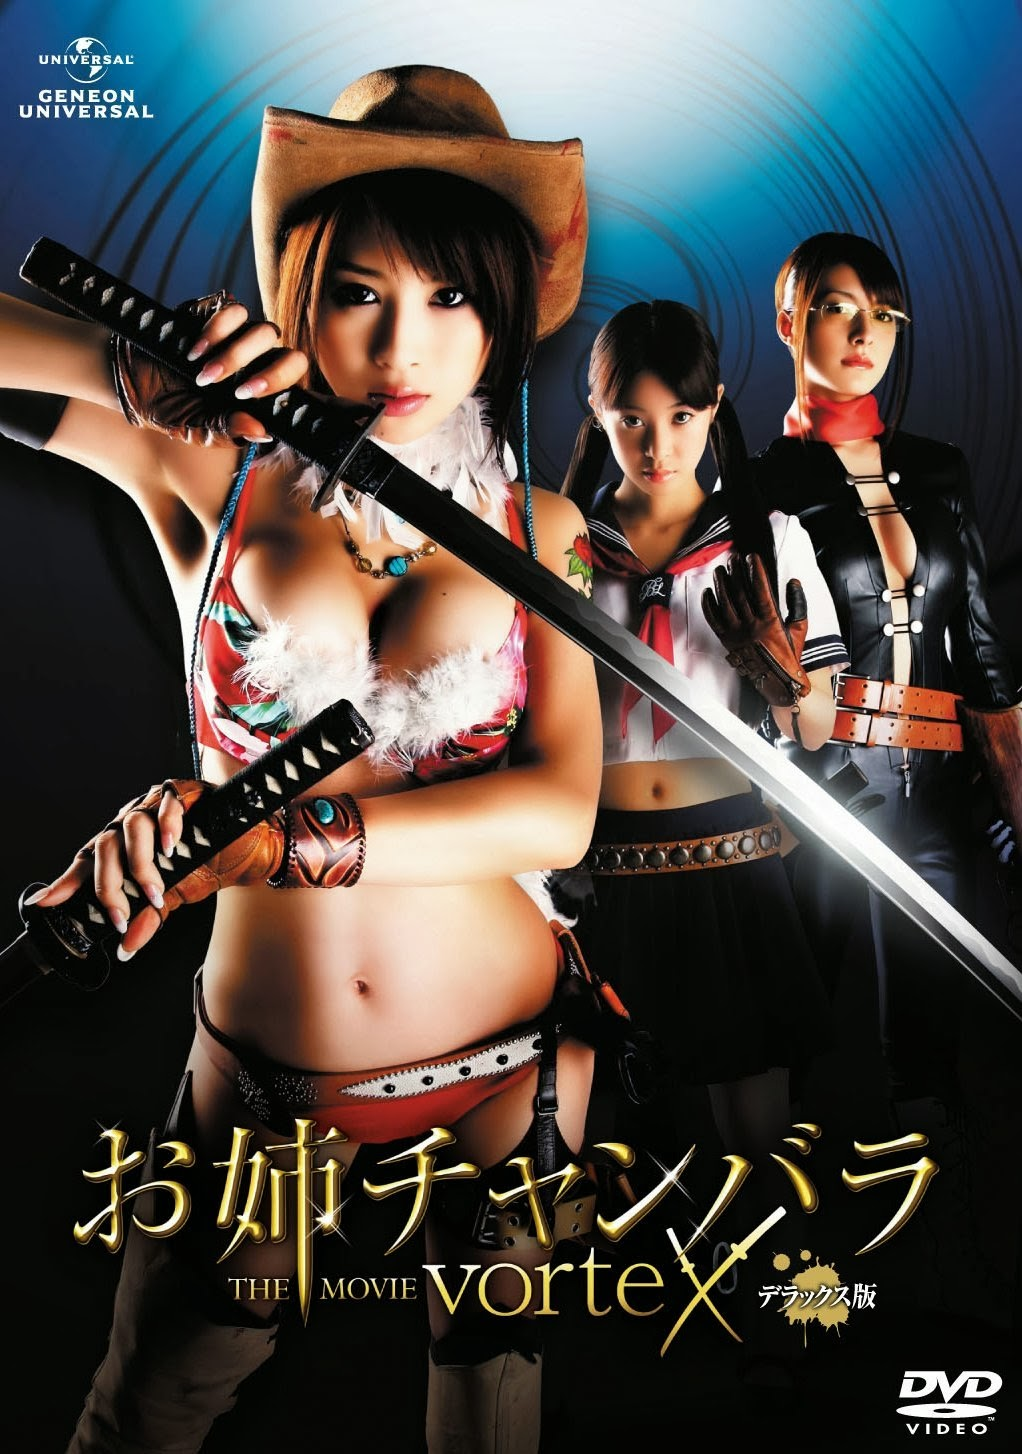 Ryan S Movie Reviews Onechanbara The Movie Vortex Review